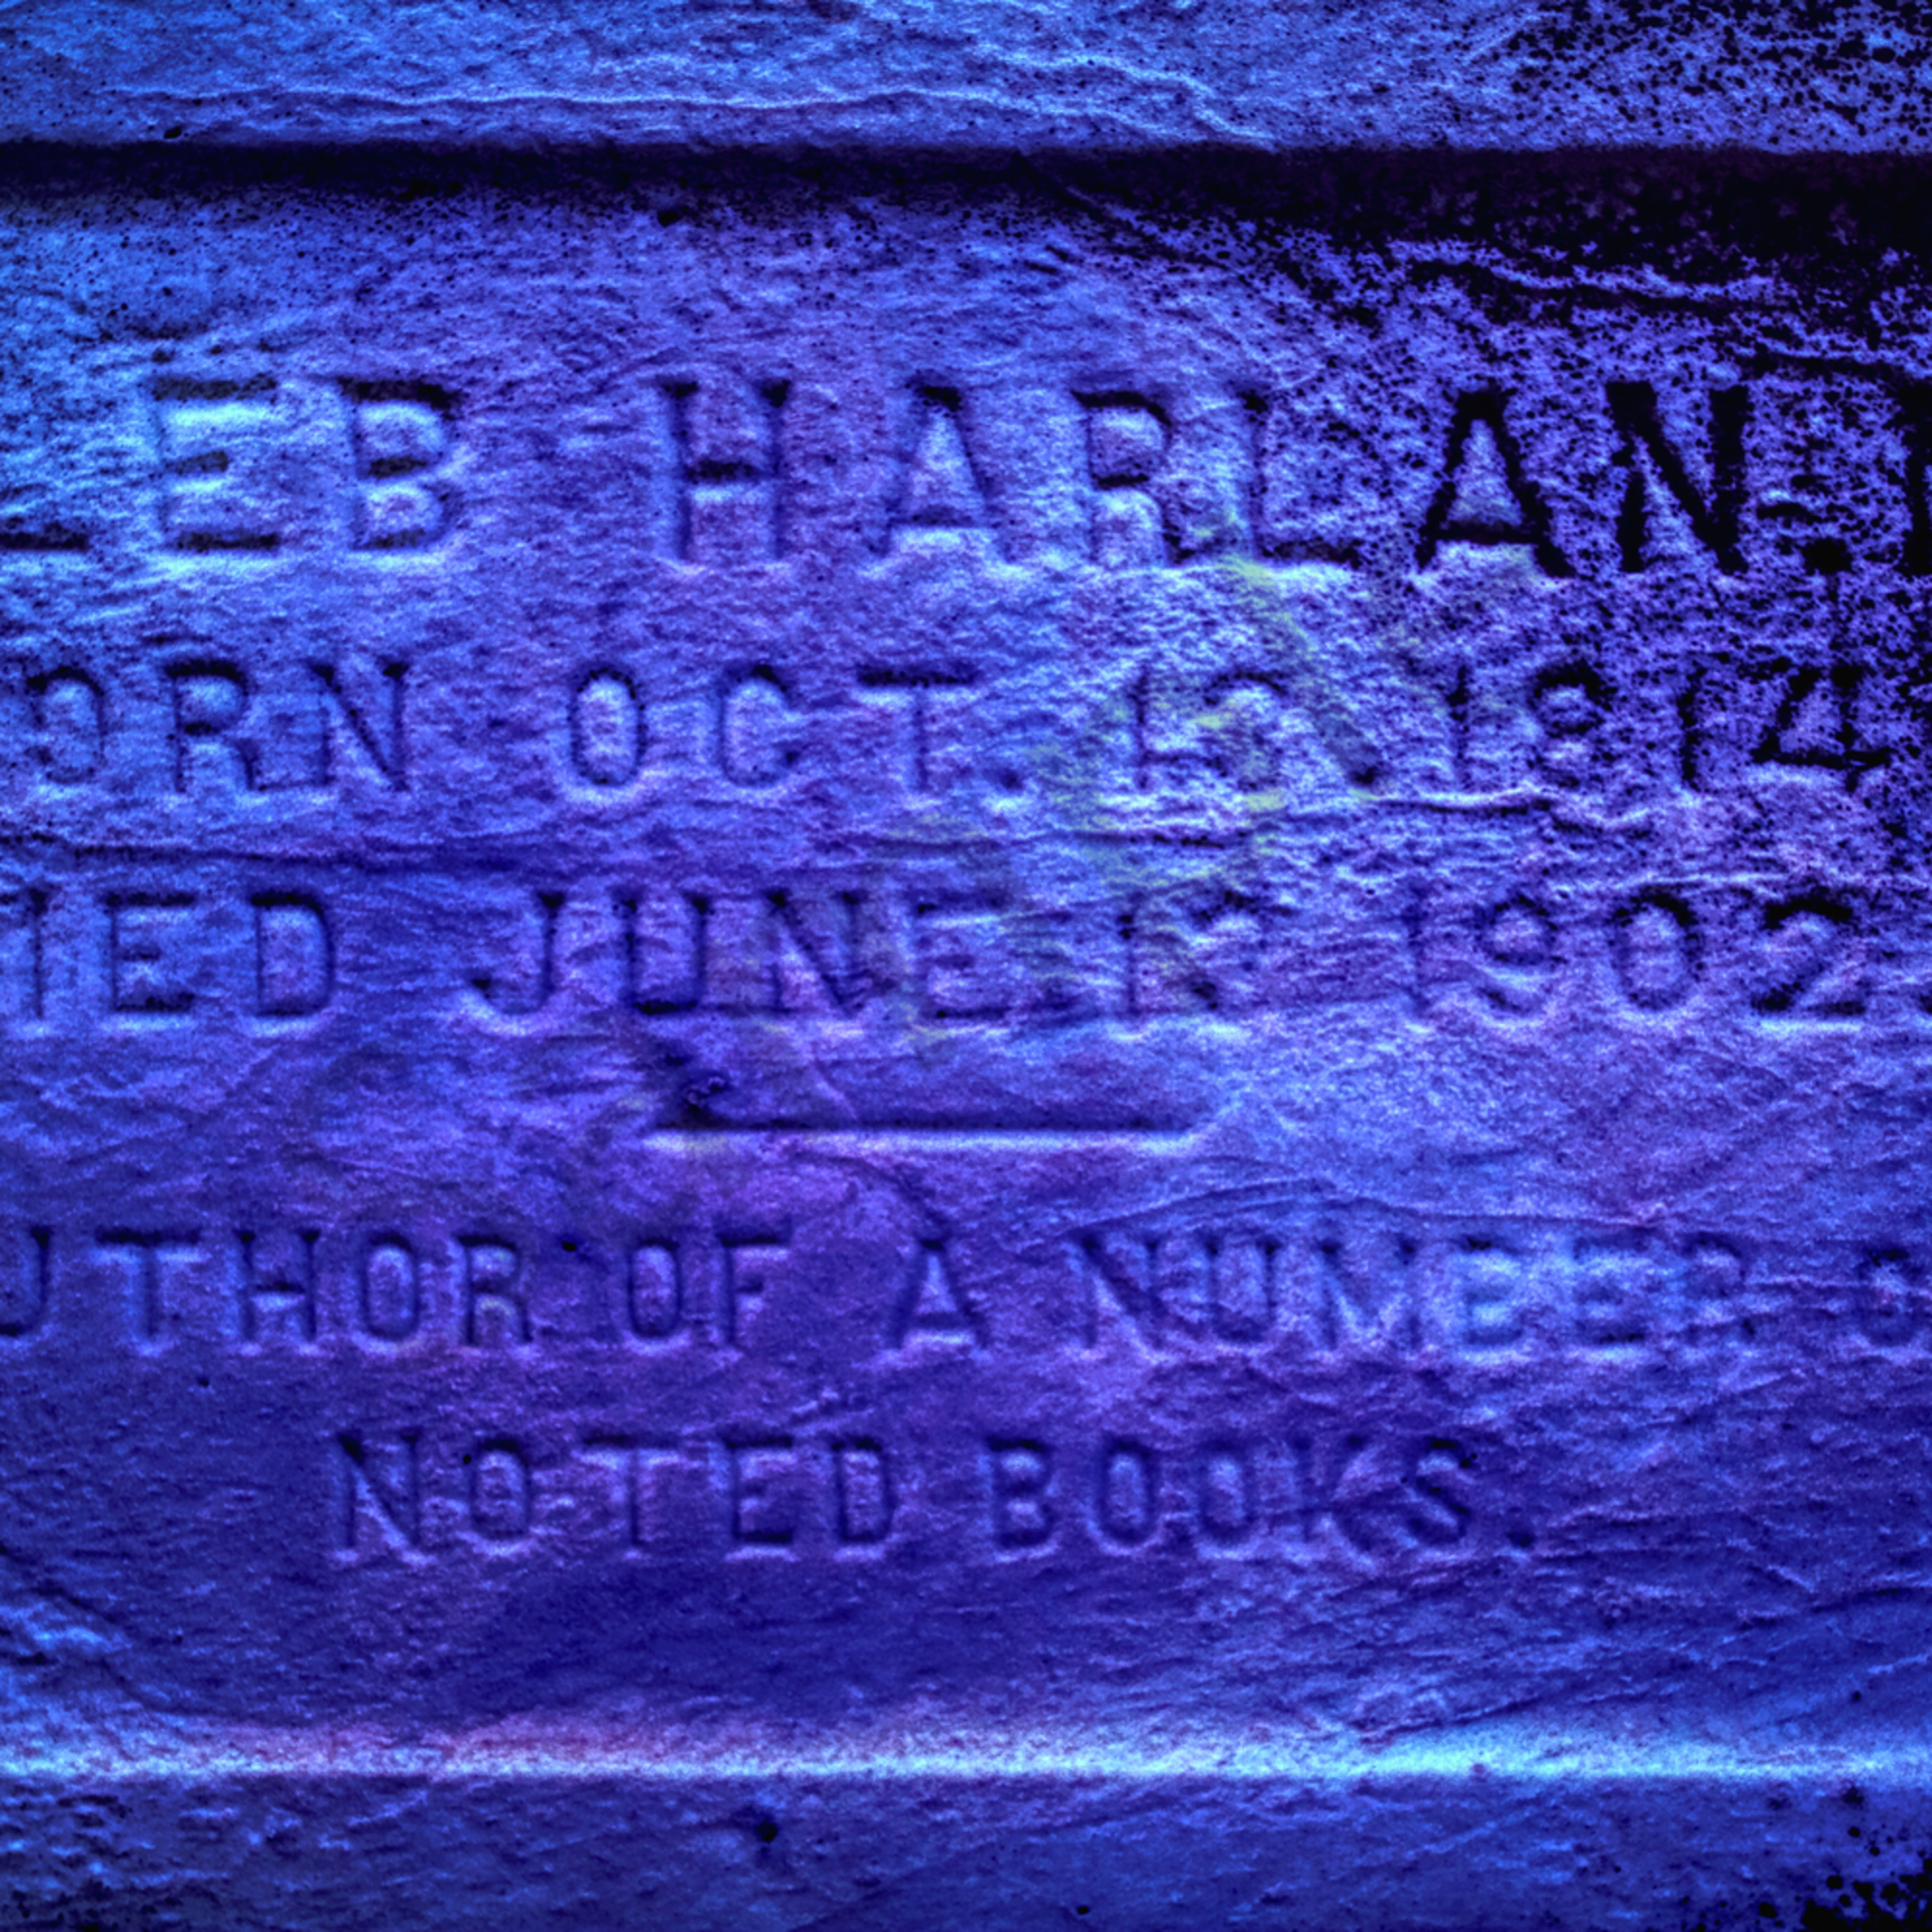 Caleb harlan gravestone website yx36wp